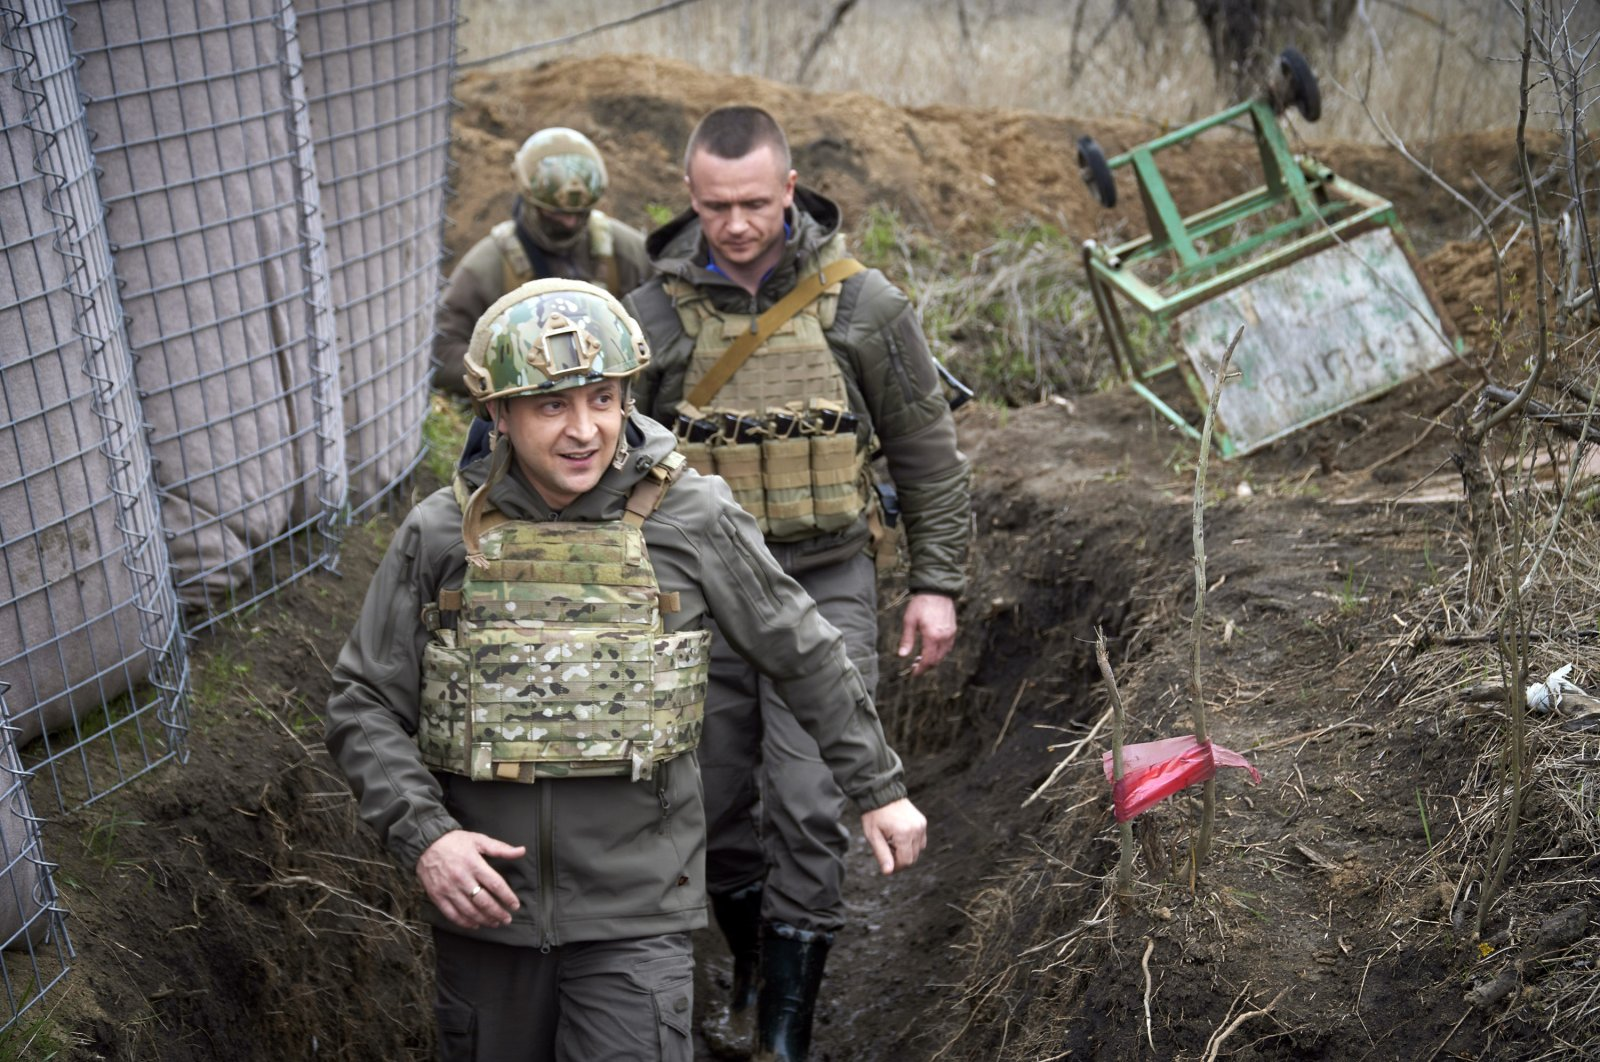 Ukrainian President Volodymyr Zelenskyy visits the war-hit Donbass region, eastern Ukraine, April 9, 2021. (Ukrainian Presidential Press Office via AP)